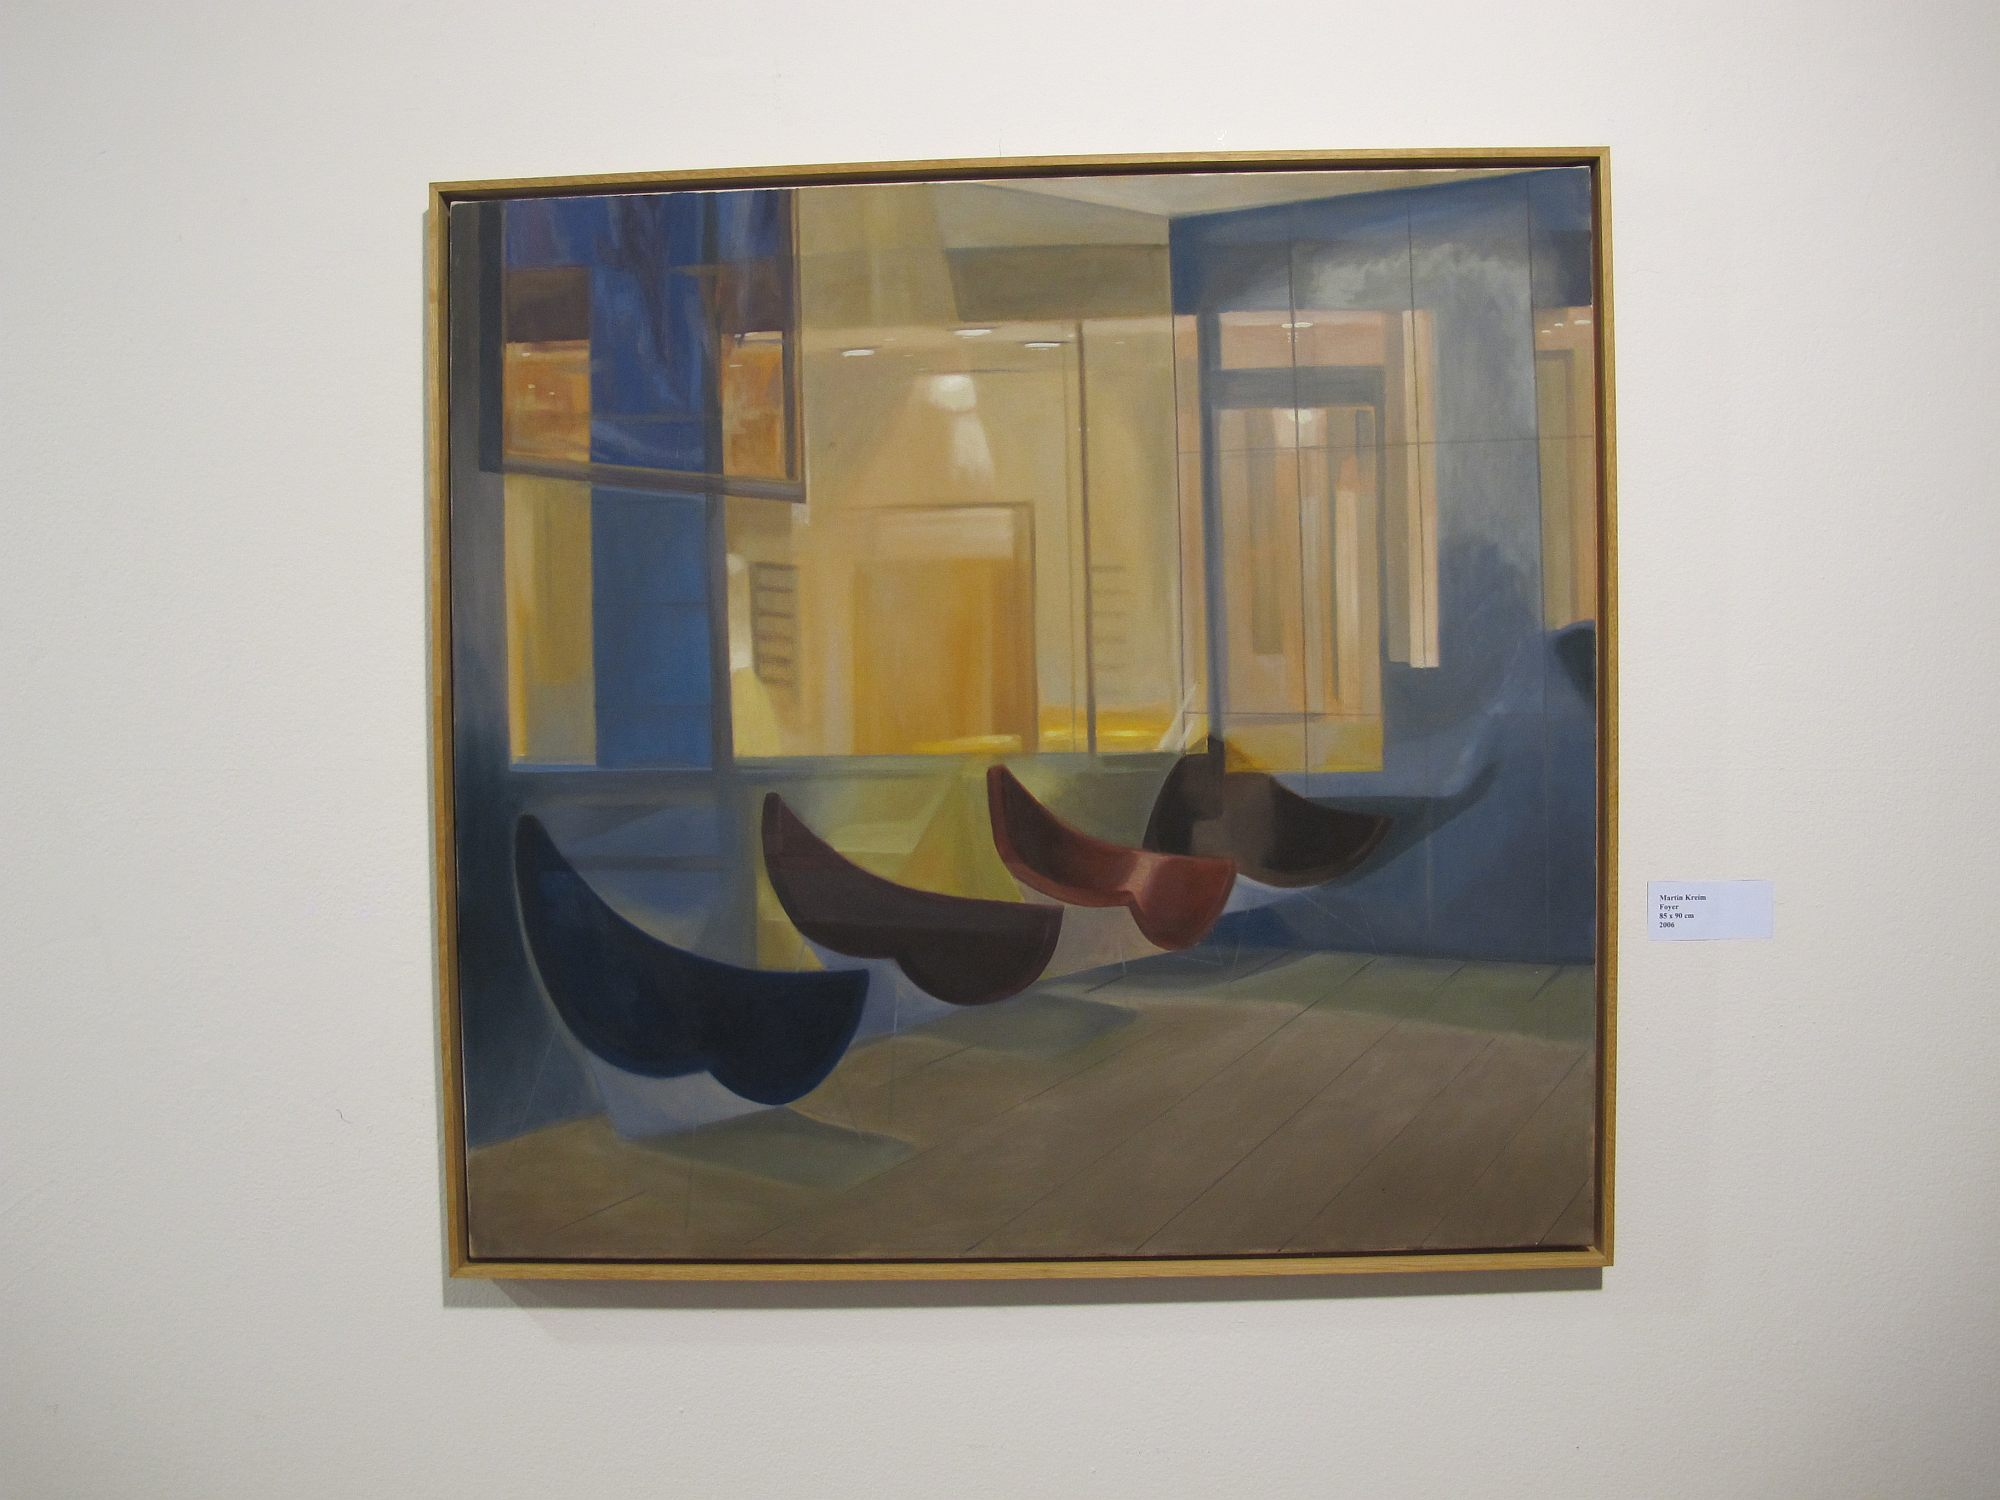 Martin Kreim, Foyer